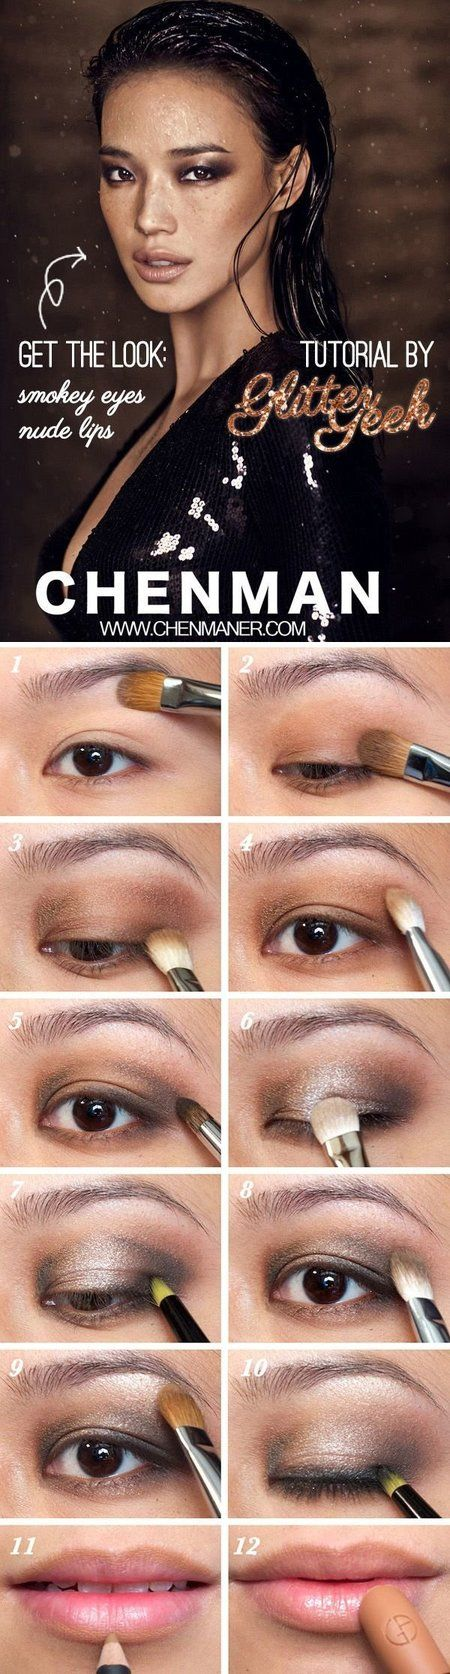 Smoked Out Eye Makeup Tutorial - #smokedout #eyemakeup #eyetutorial